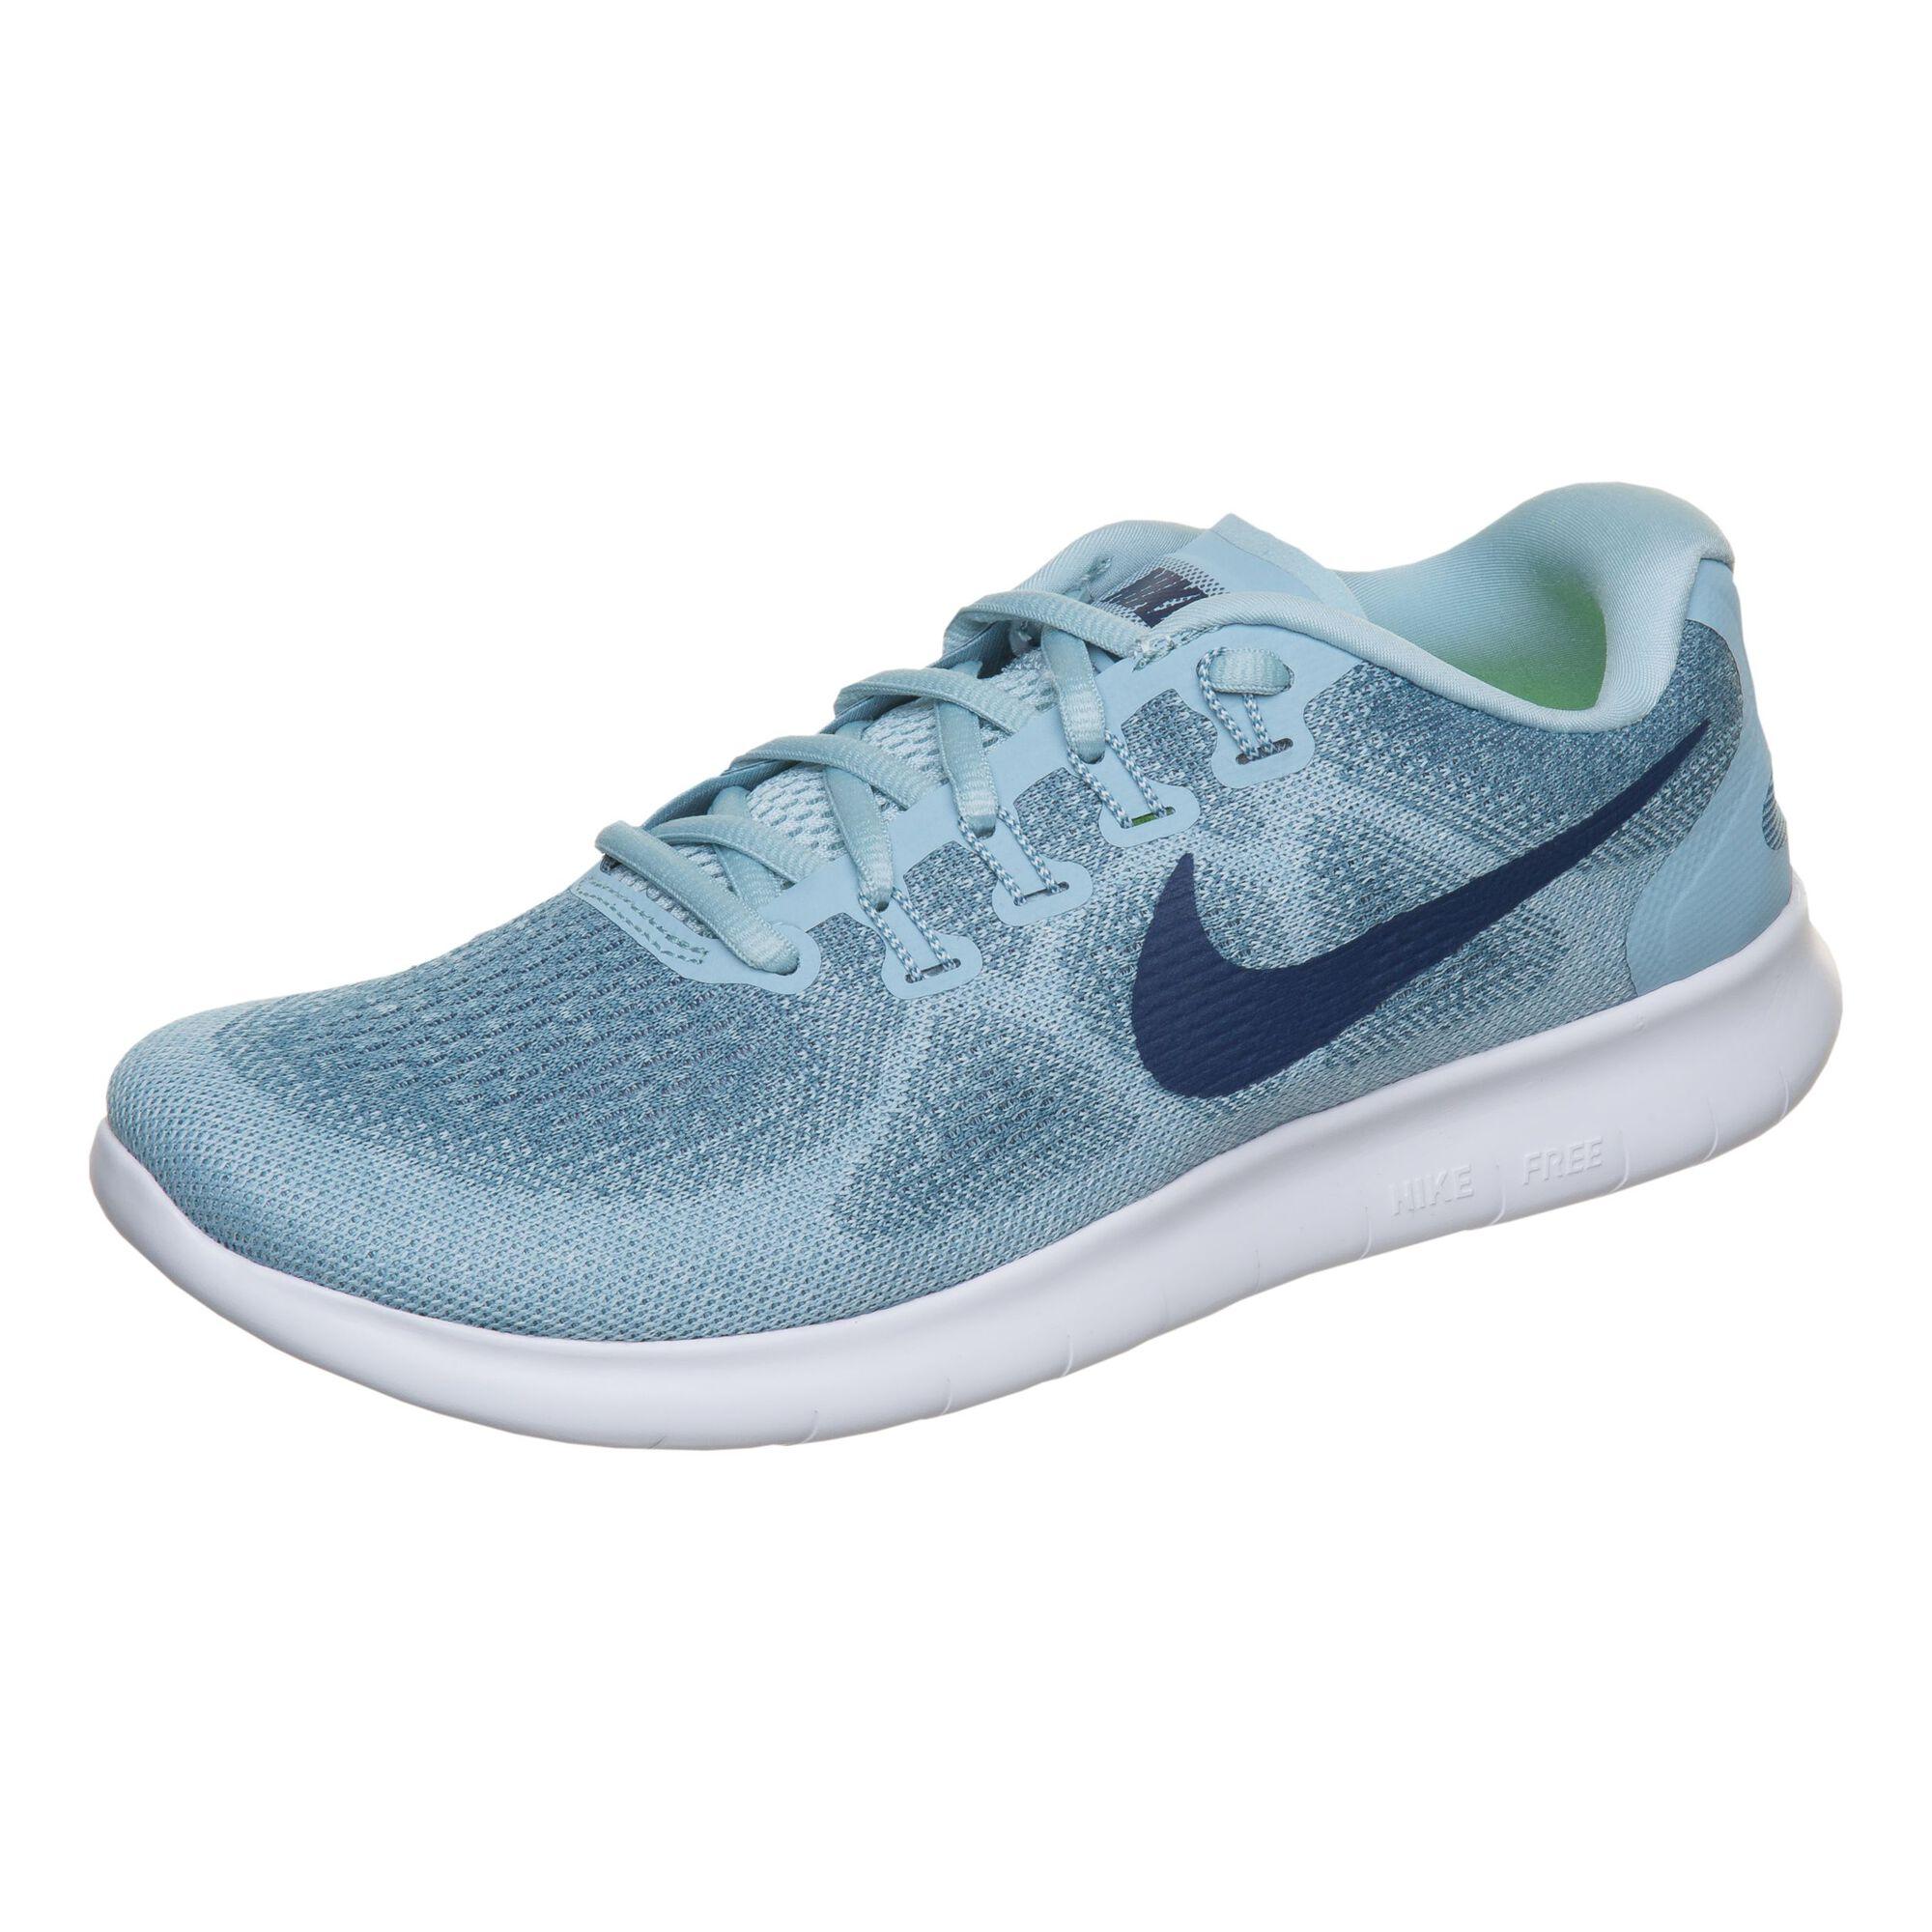 e18ab3d542509 buy Nike Free Run Flyknit 2017 Natural Running Shoe Women - Light ...